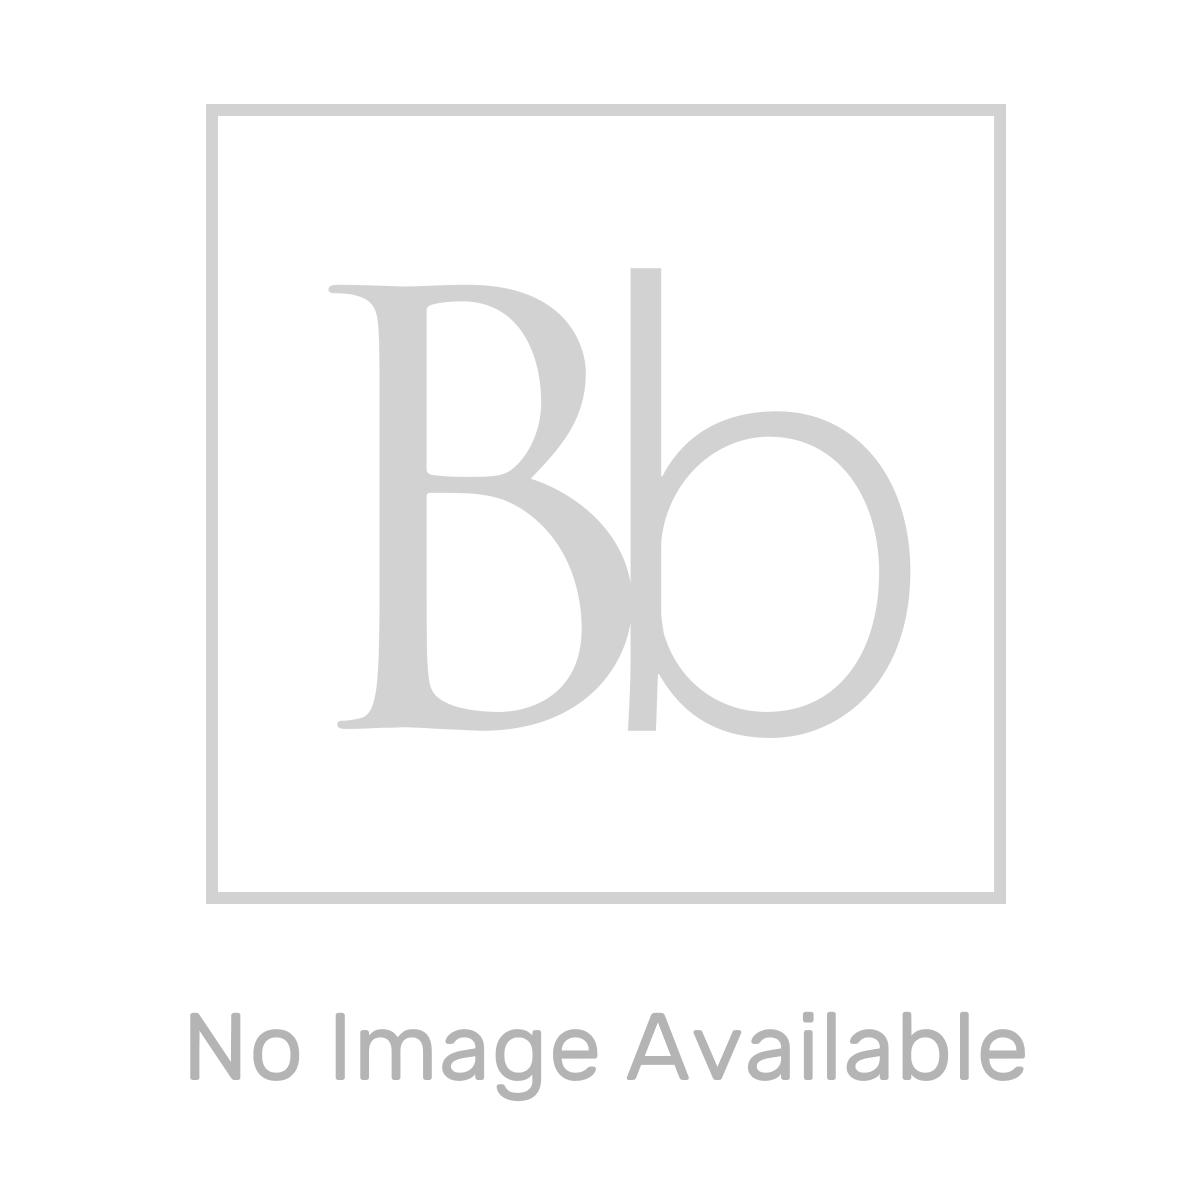 Croydex Compact 3-Tier Plastic Bathroom Shelving Unit